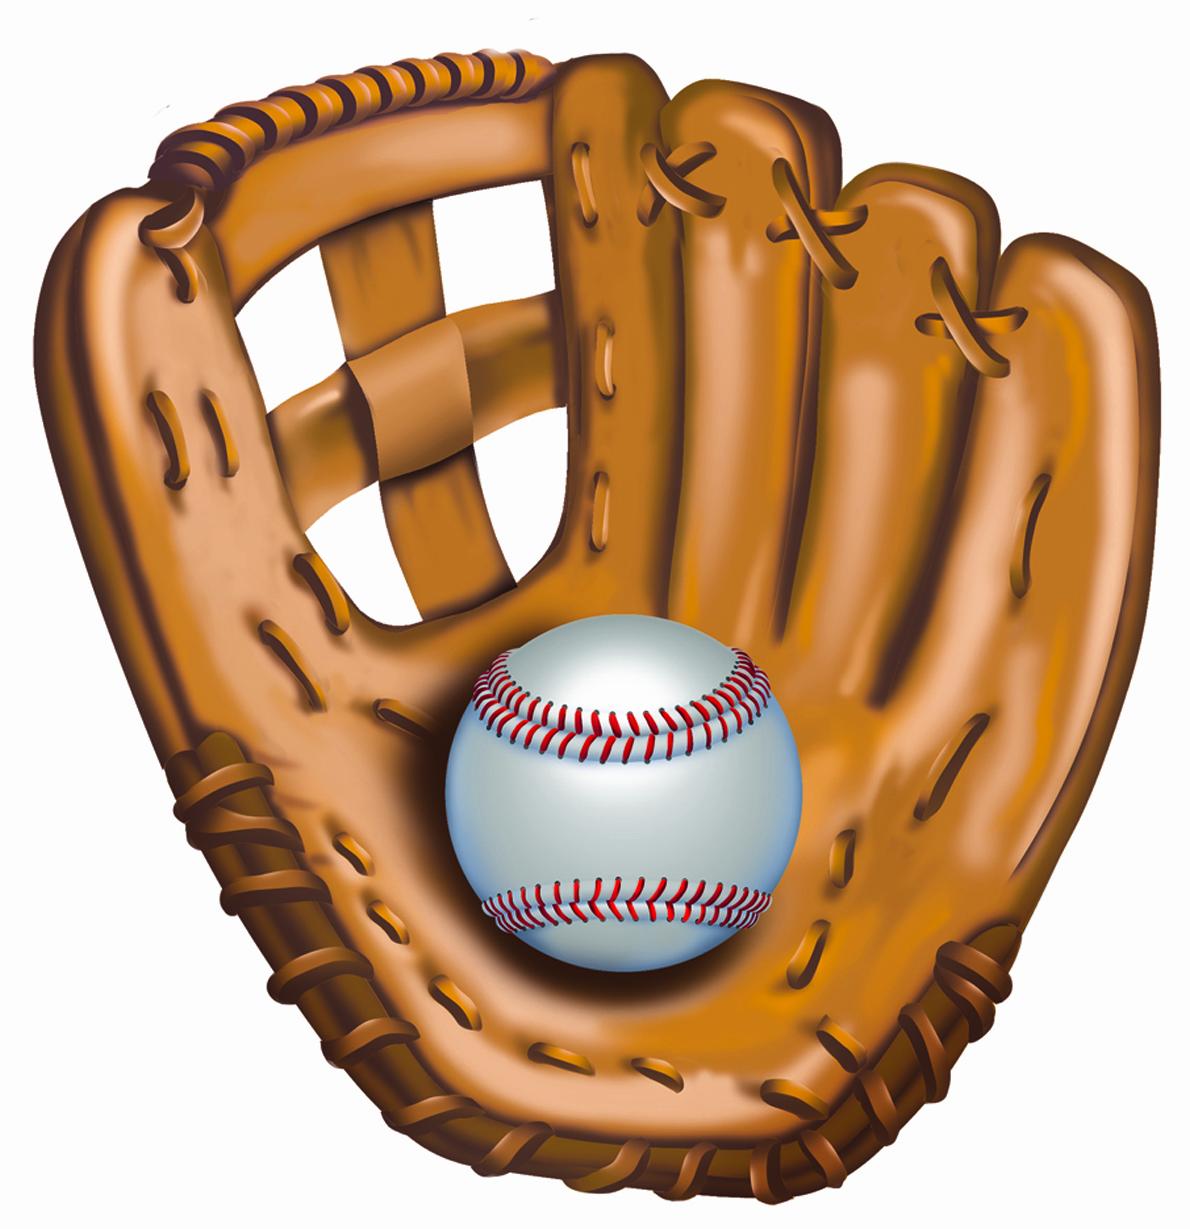 Baseball clipart free baseball graphics image 6